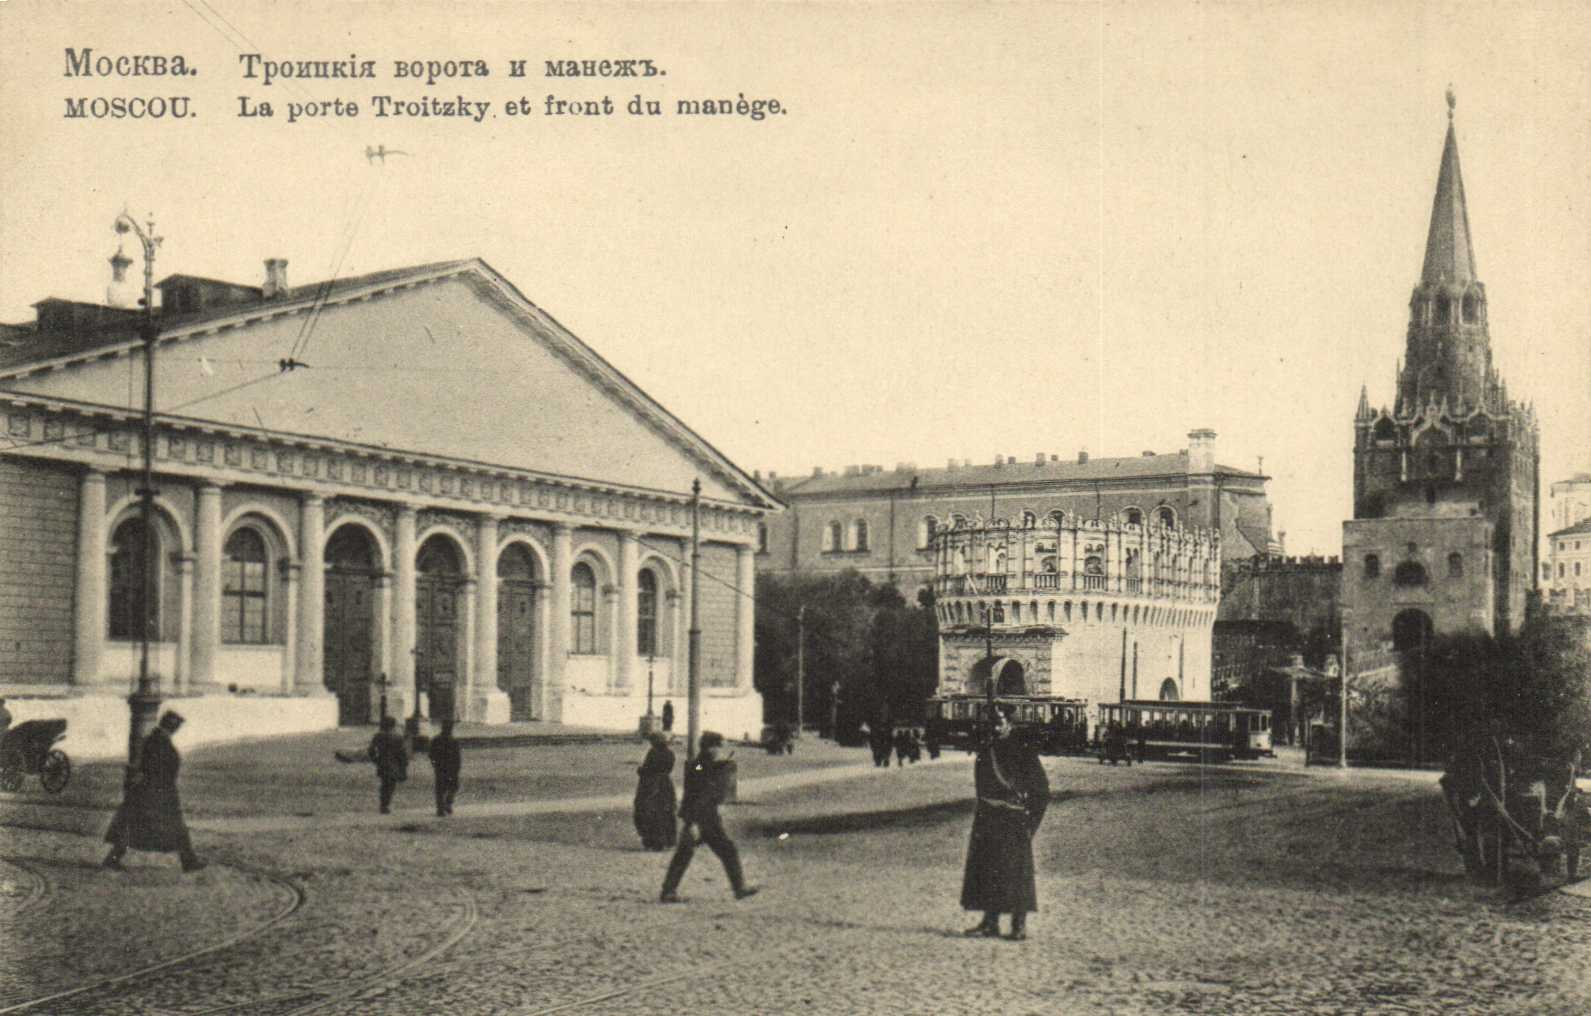 Троицкие ворота и манеж